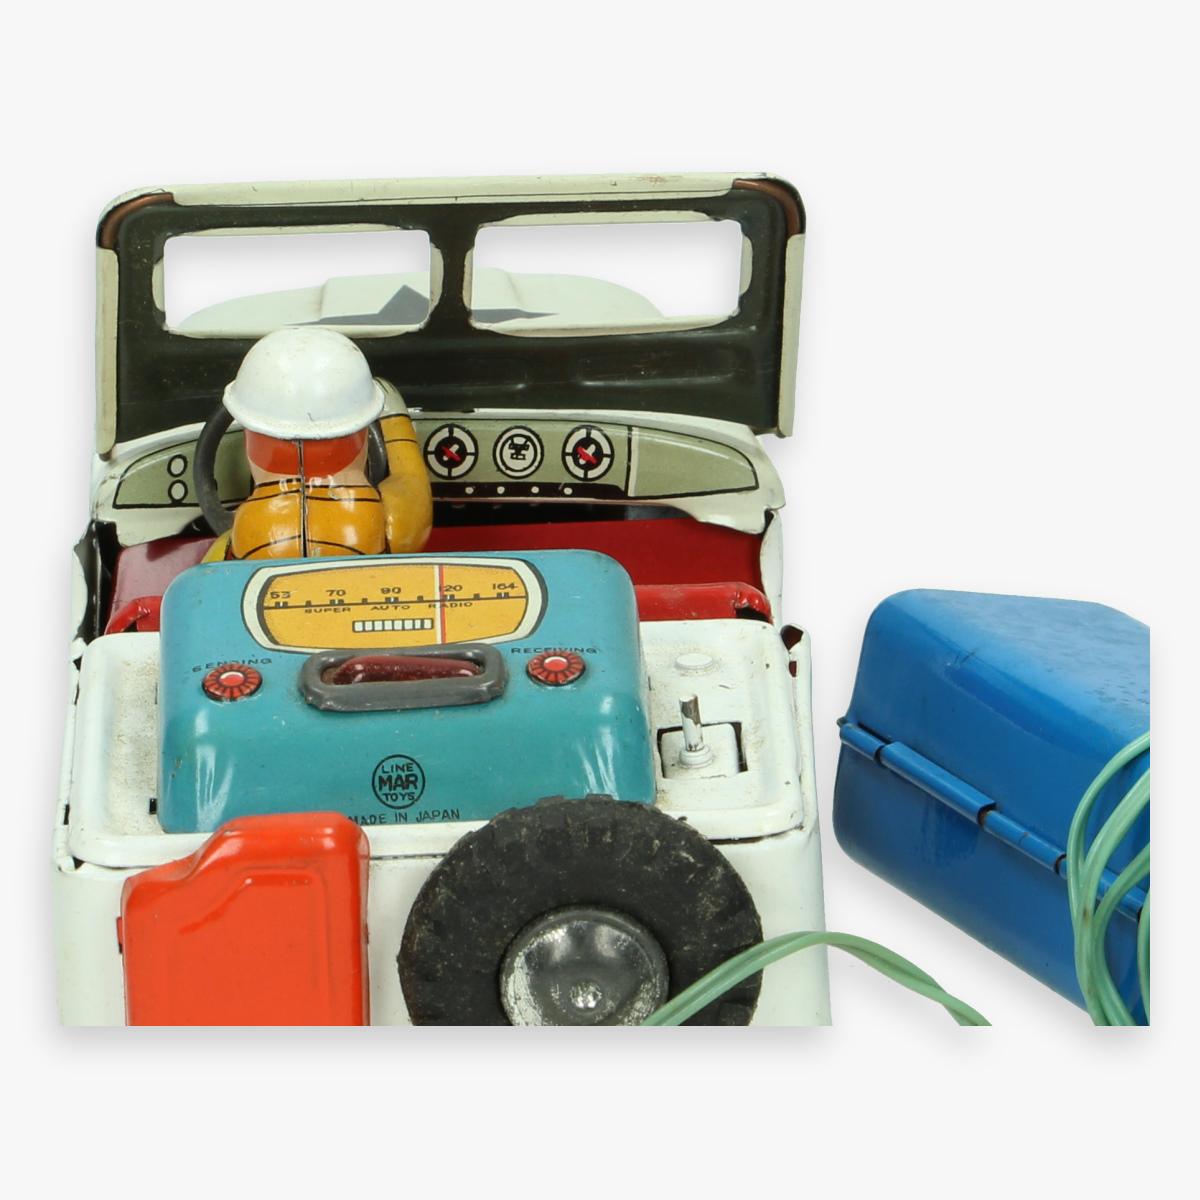 Afbeeldingen van u-turn tin toy jeep (willy's) boxed linemar trade mark